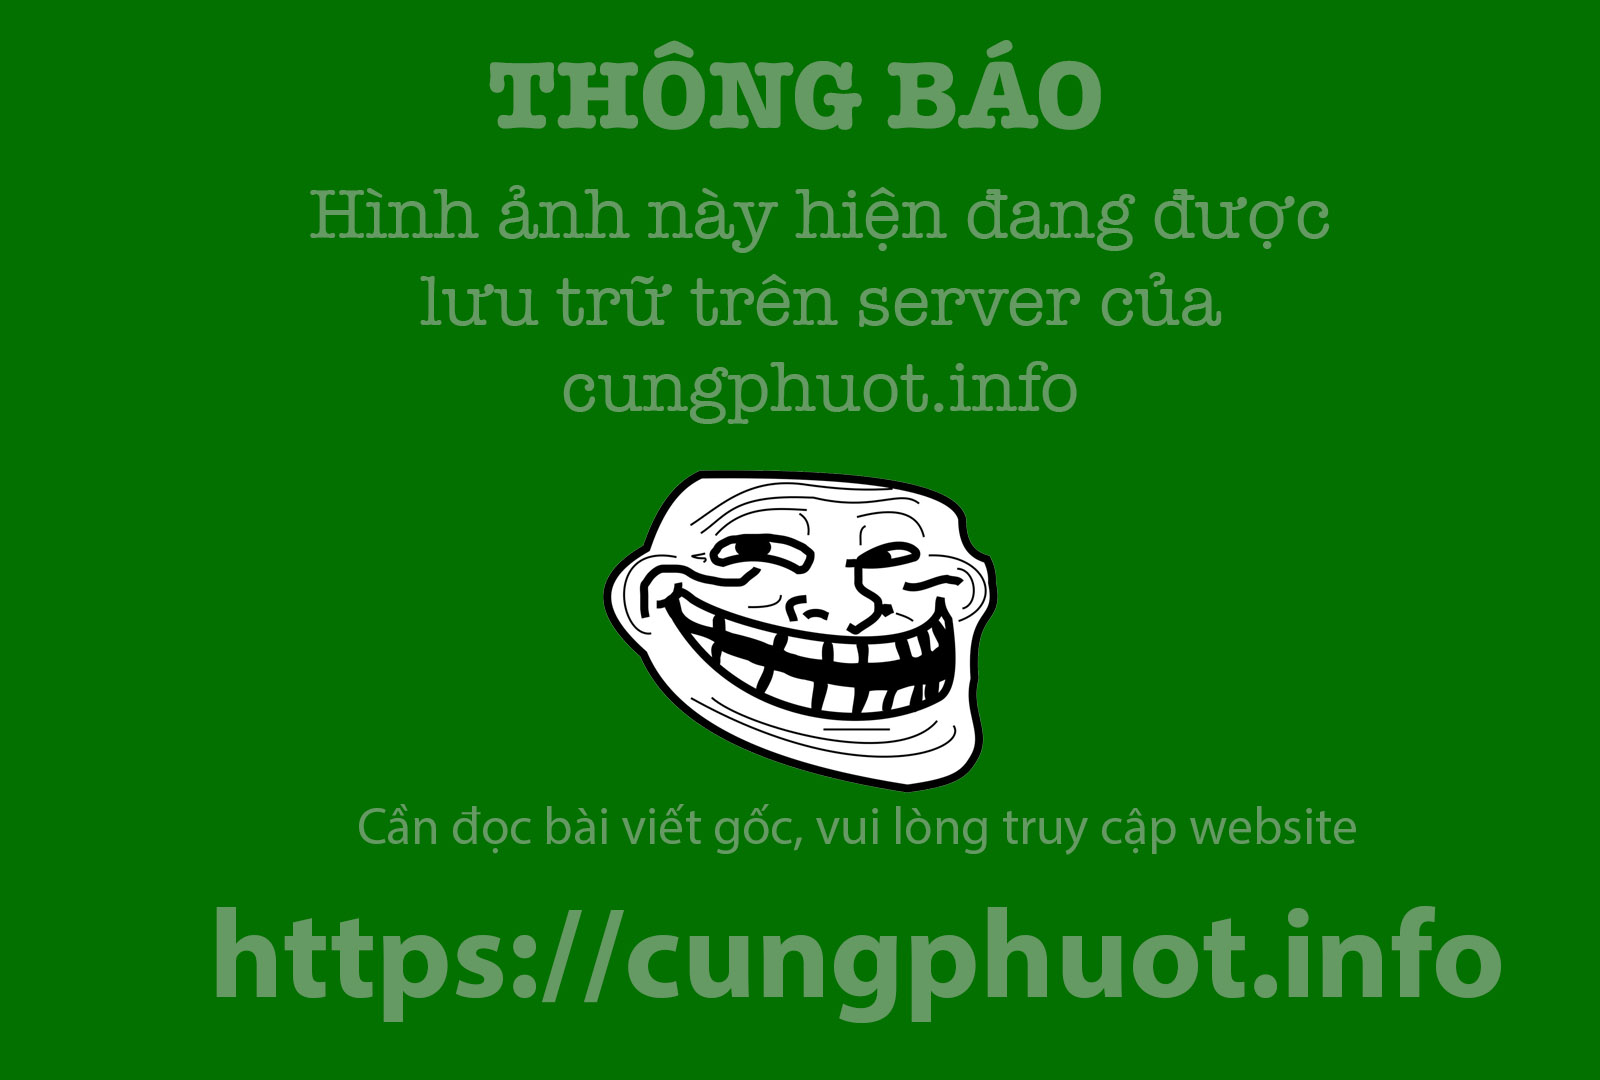 Co do Hue dep la trong suong mu hinh anh 17